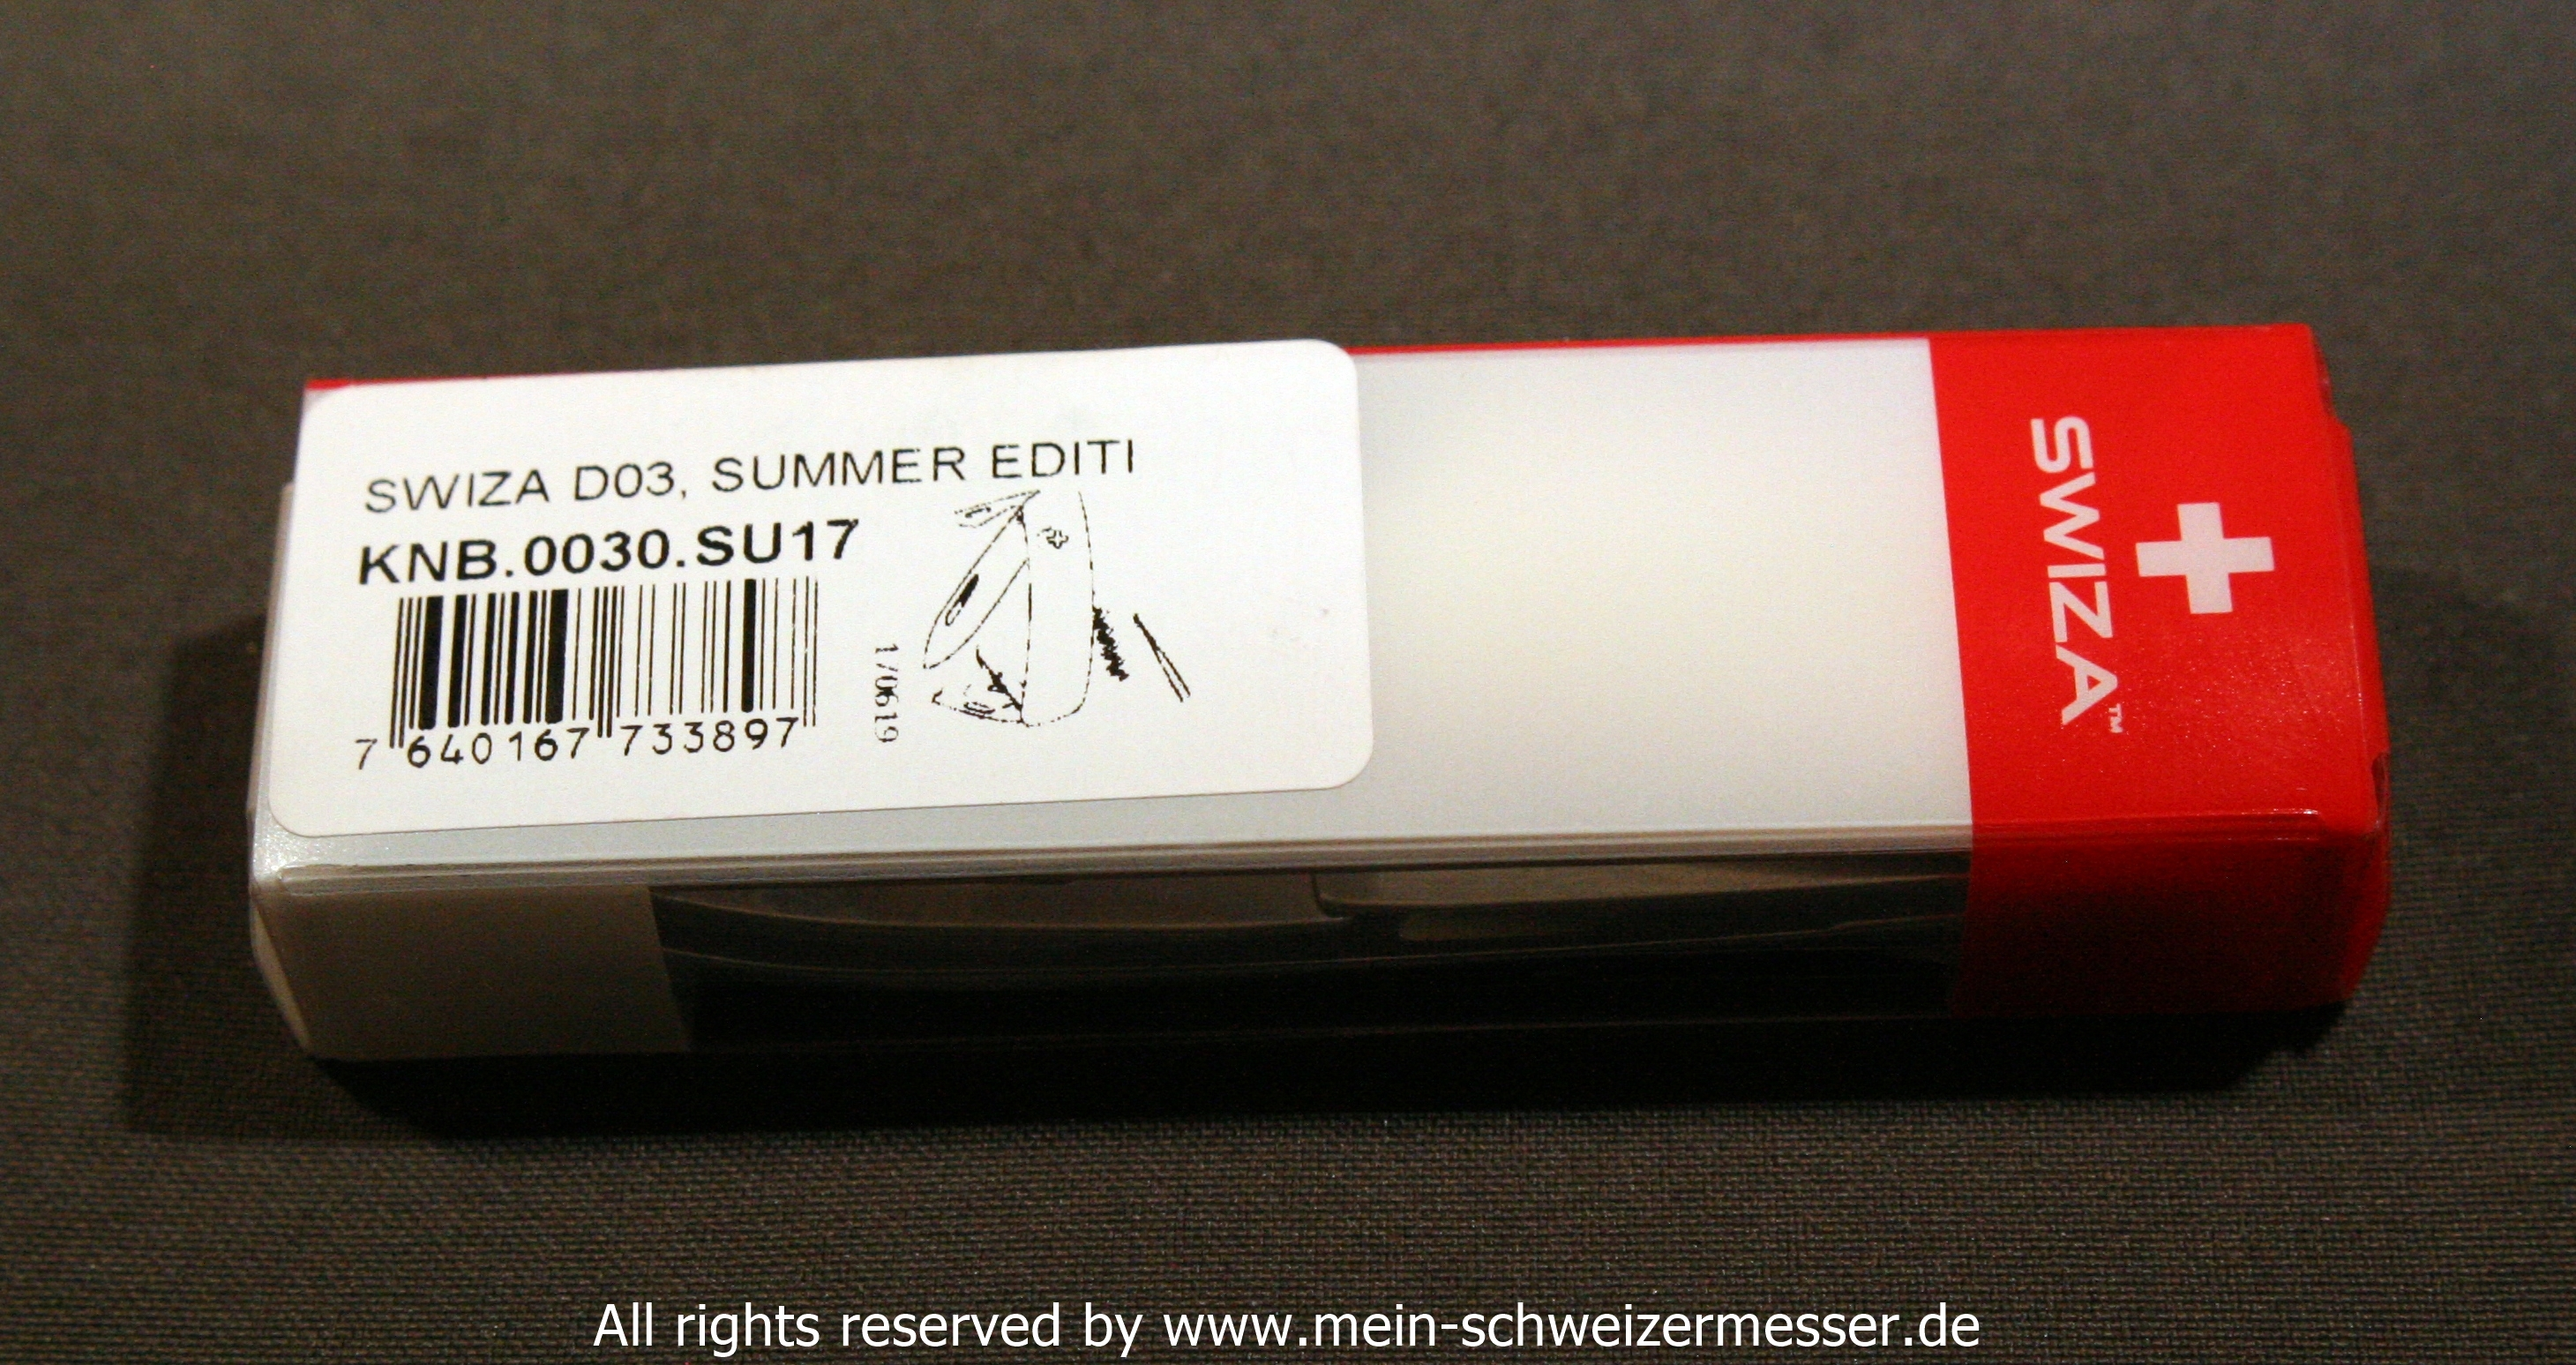 Mein Schweizermesser Swiss Army Knife Swiza D03